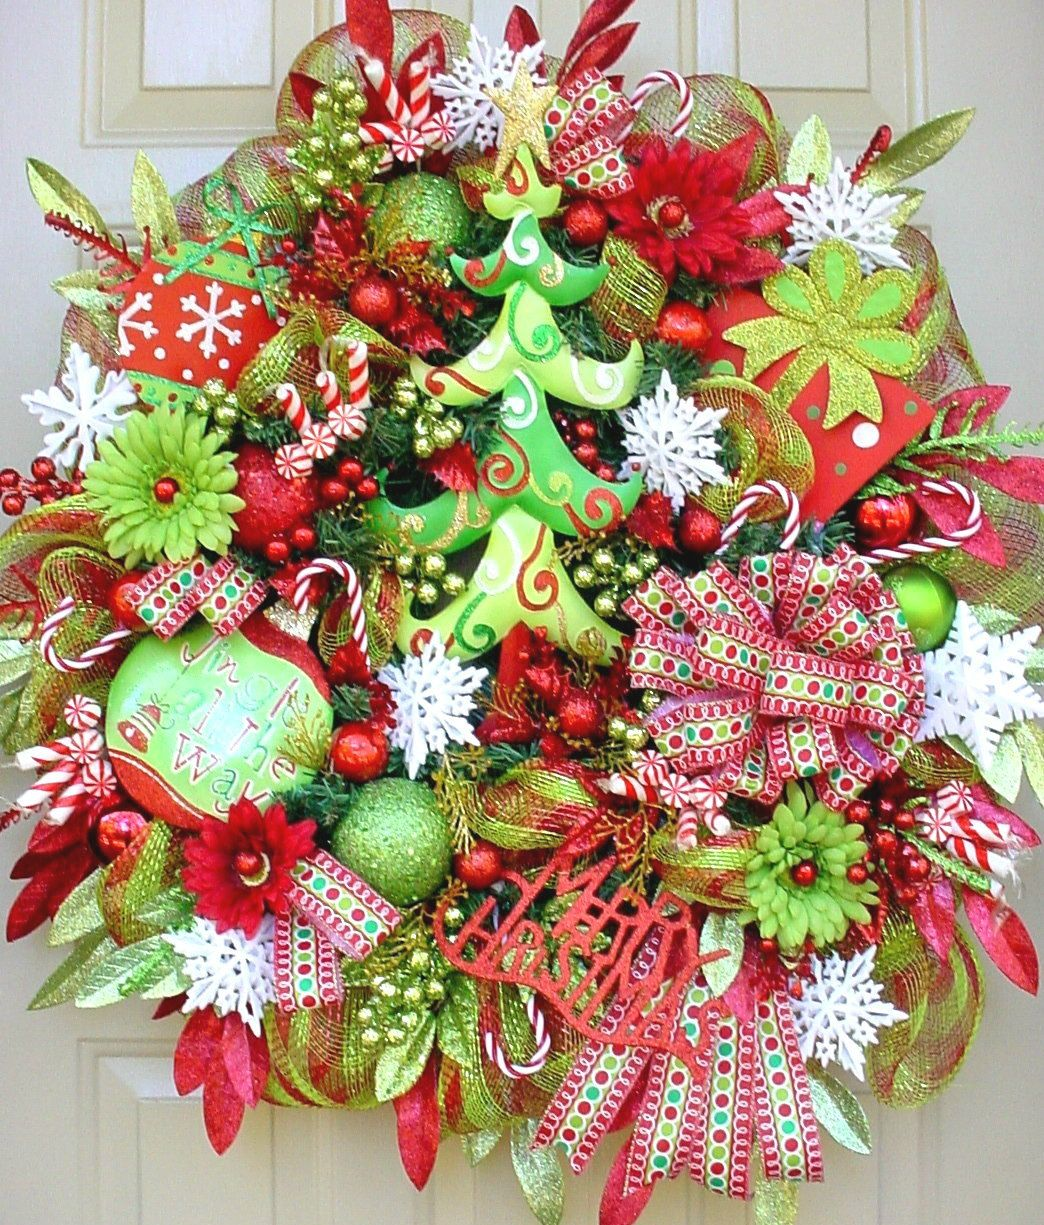 O Christmas Tree-Christmas Holiday Wreath In Lime Greens